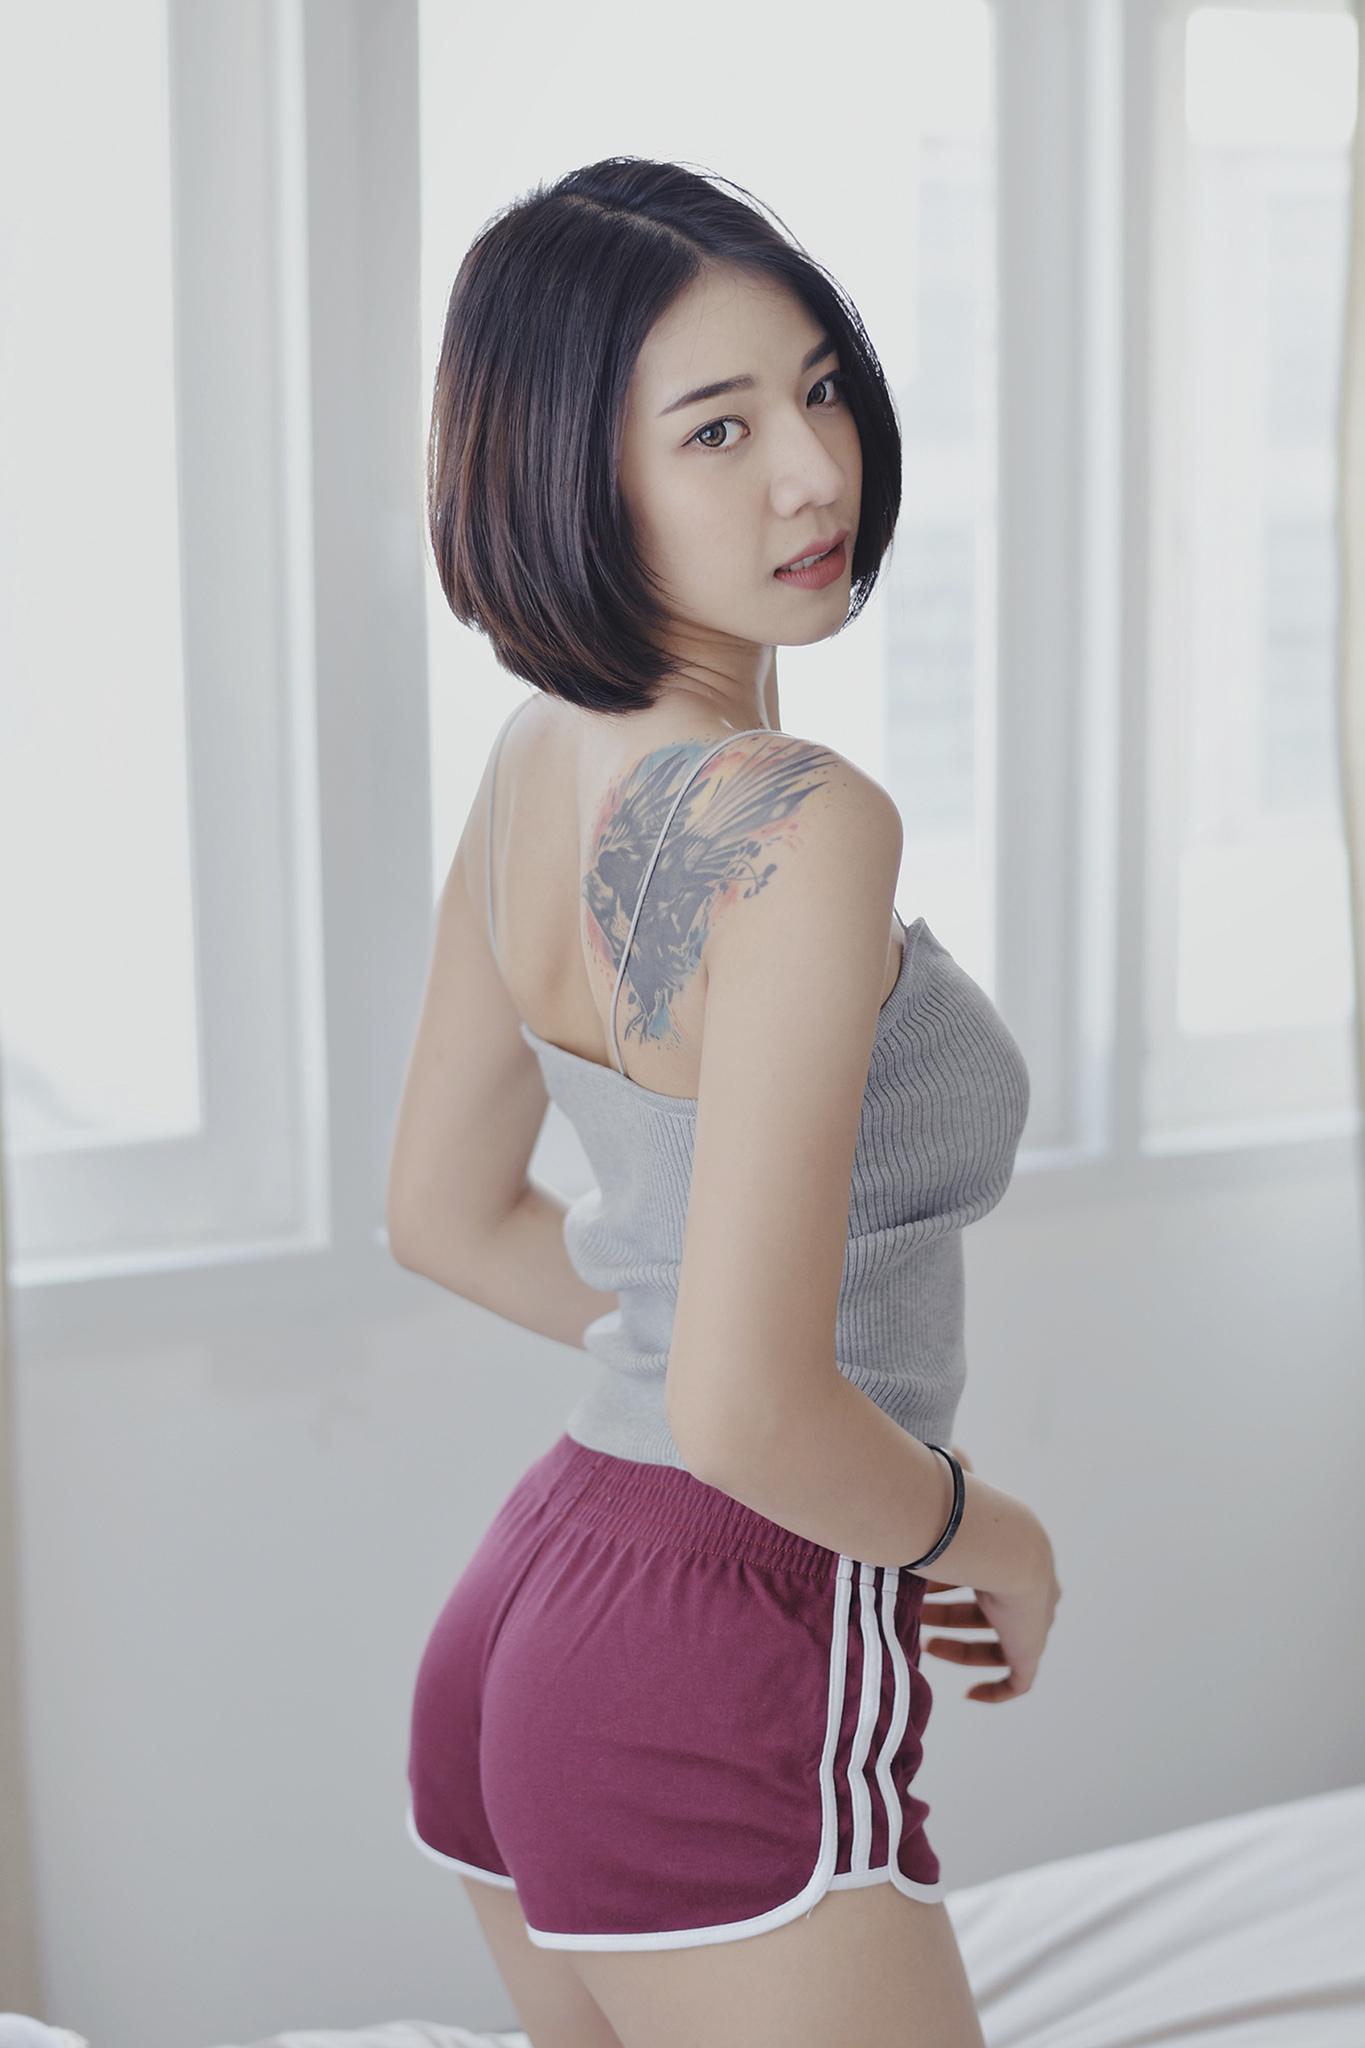 Wallpaper Model Brunette Asian Looking At Viewer Portrait Display Inked Girls Tattoo Tank Top Short Shorts Standing Window Depth Of Field Women Indoors 1365x2048 Wizigoths 1541489 Hd Wallpapers Wallhere